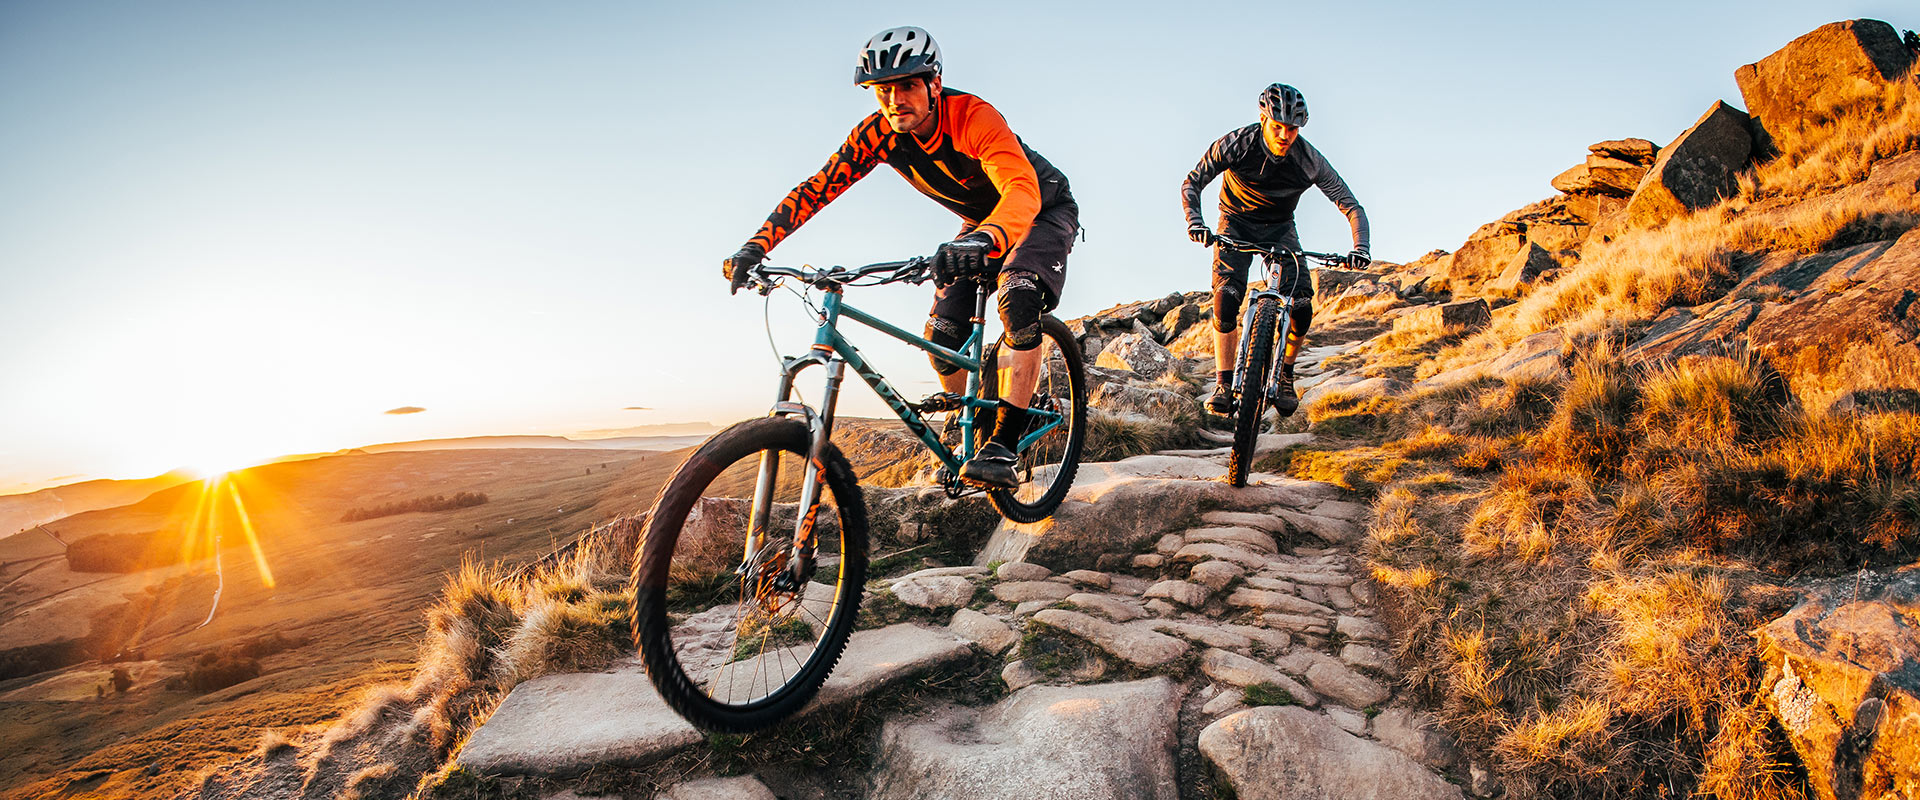 steel full suspension bike, Reynolds 853, steel is real, Cotic, Cotic bikes, best full suspension bike, mountain bike, mountain biking, enduro mountain bike, 160mm travel, 29er mountain bike, 29